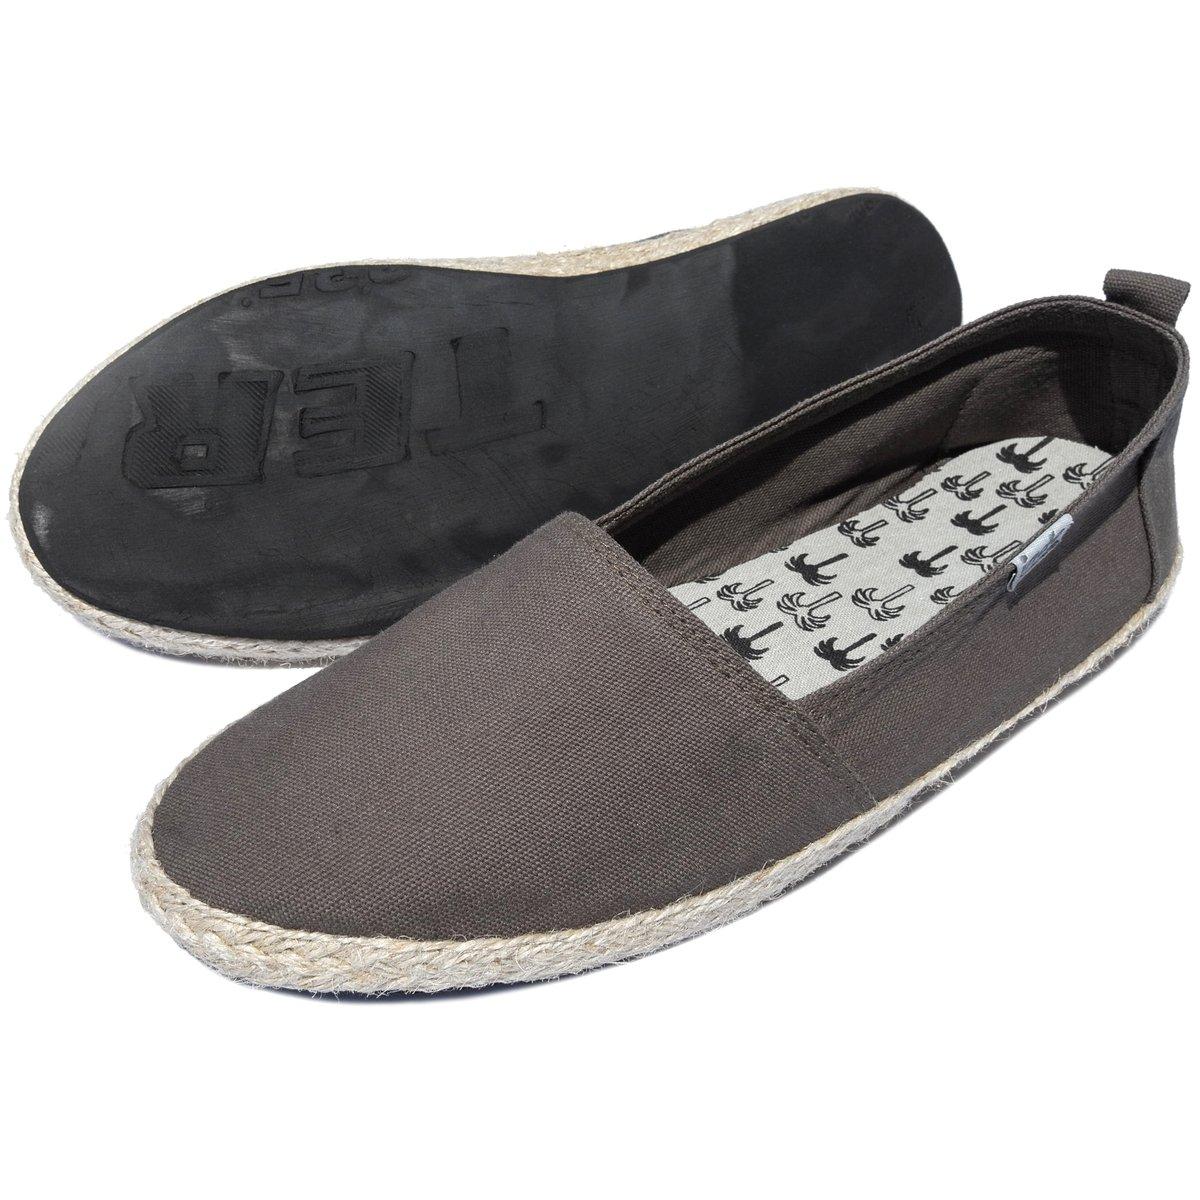 dark_army_green_womens_shoes_square_600x@2x.jpg